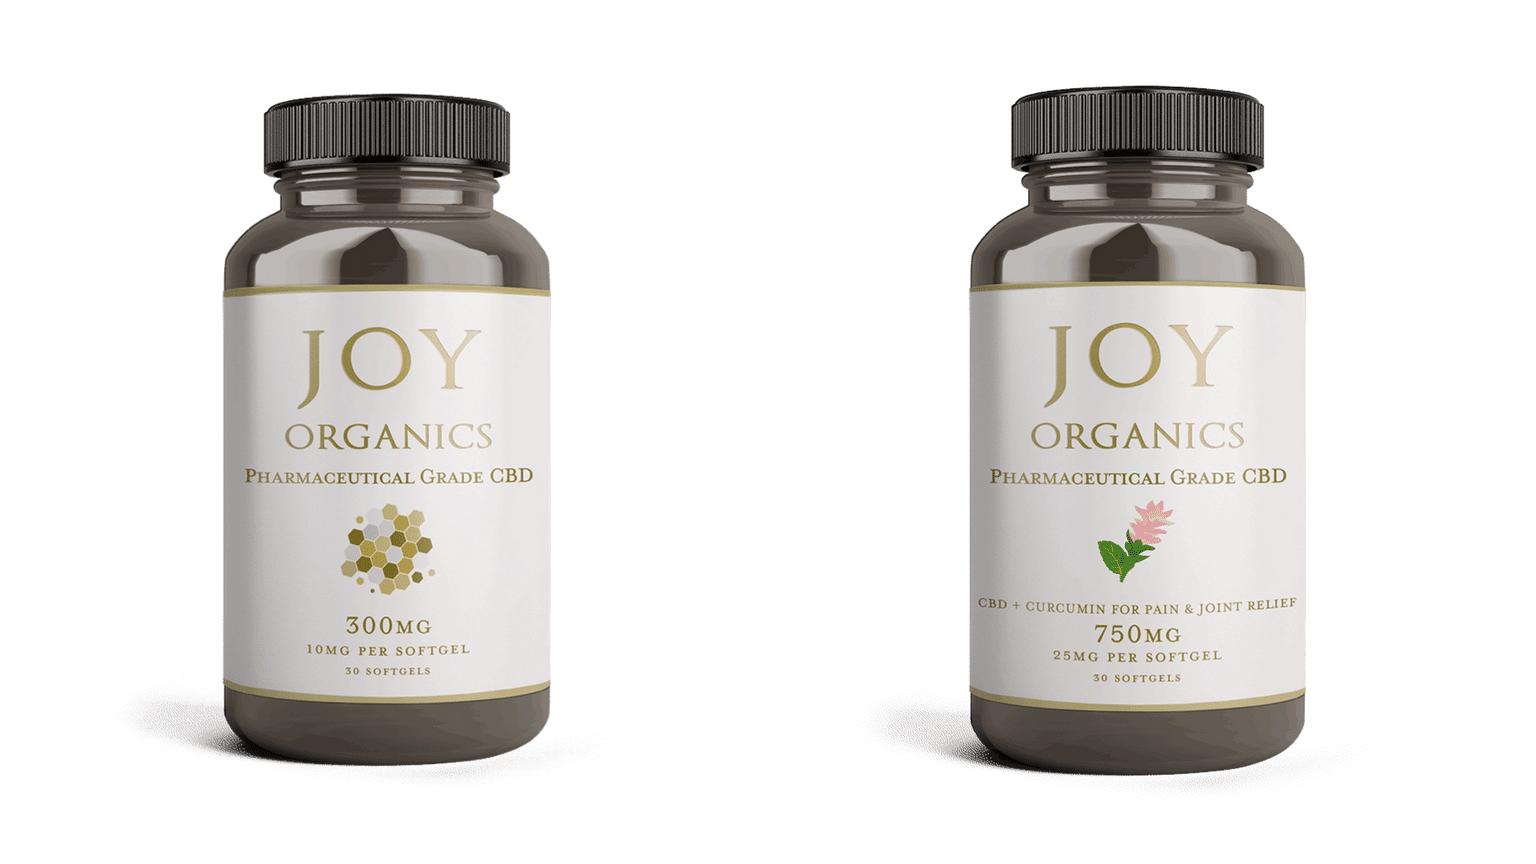 joy-organics-cbd-capsules